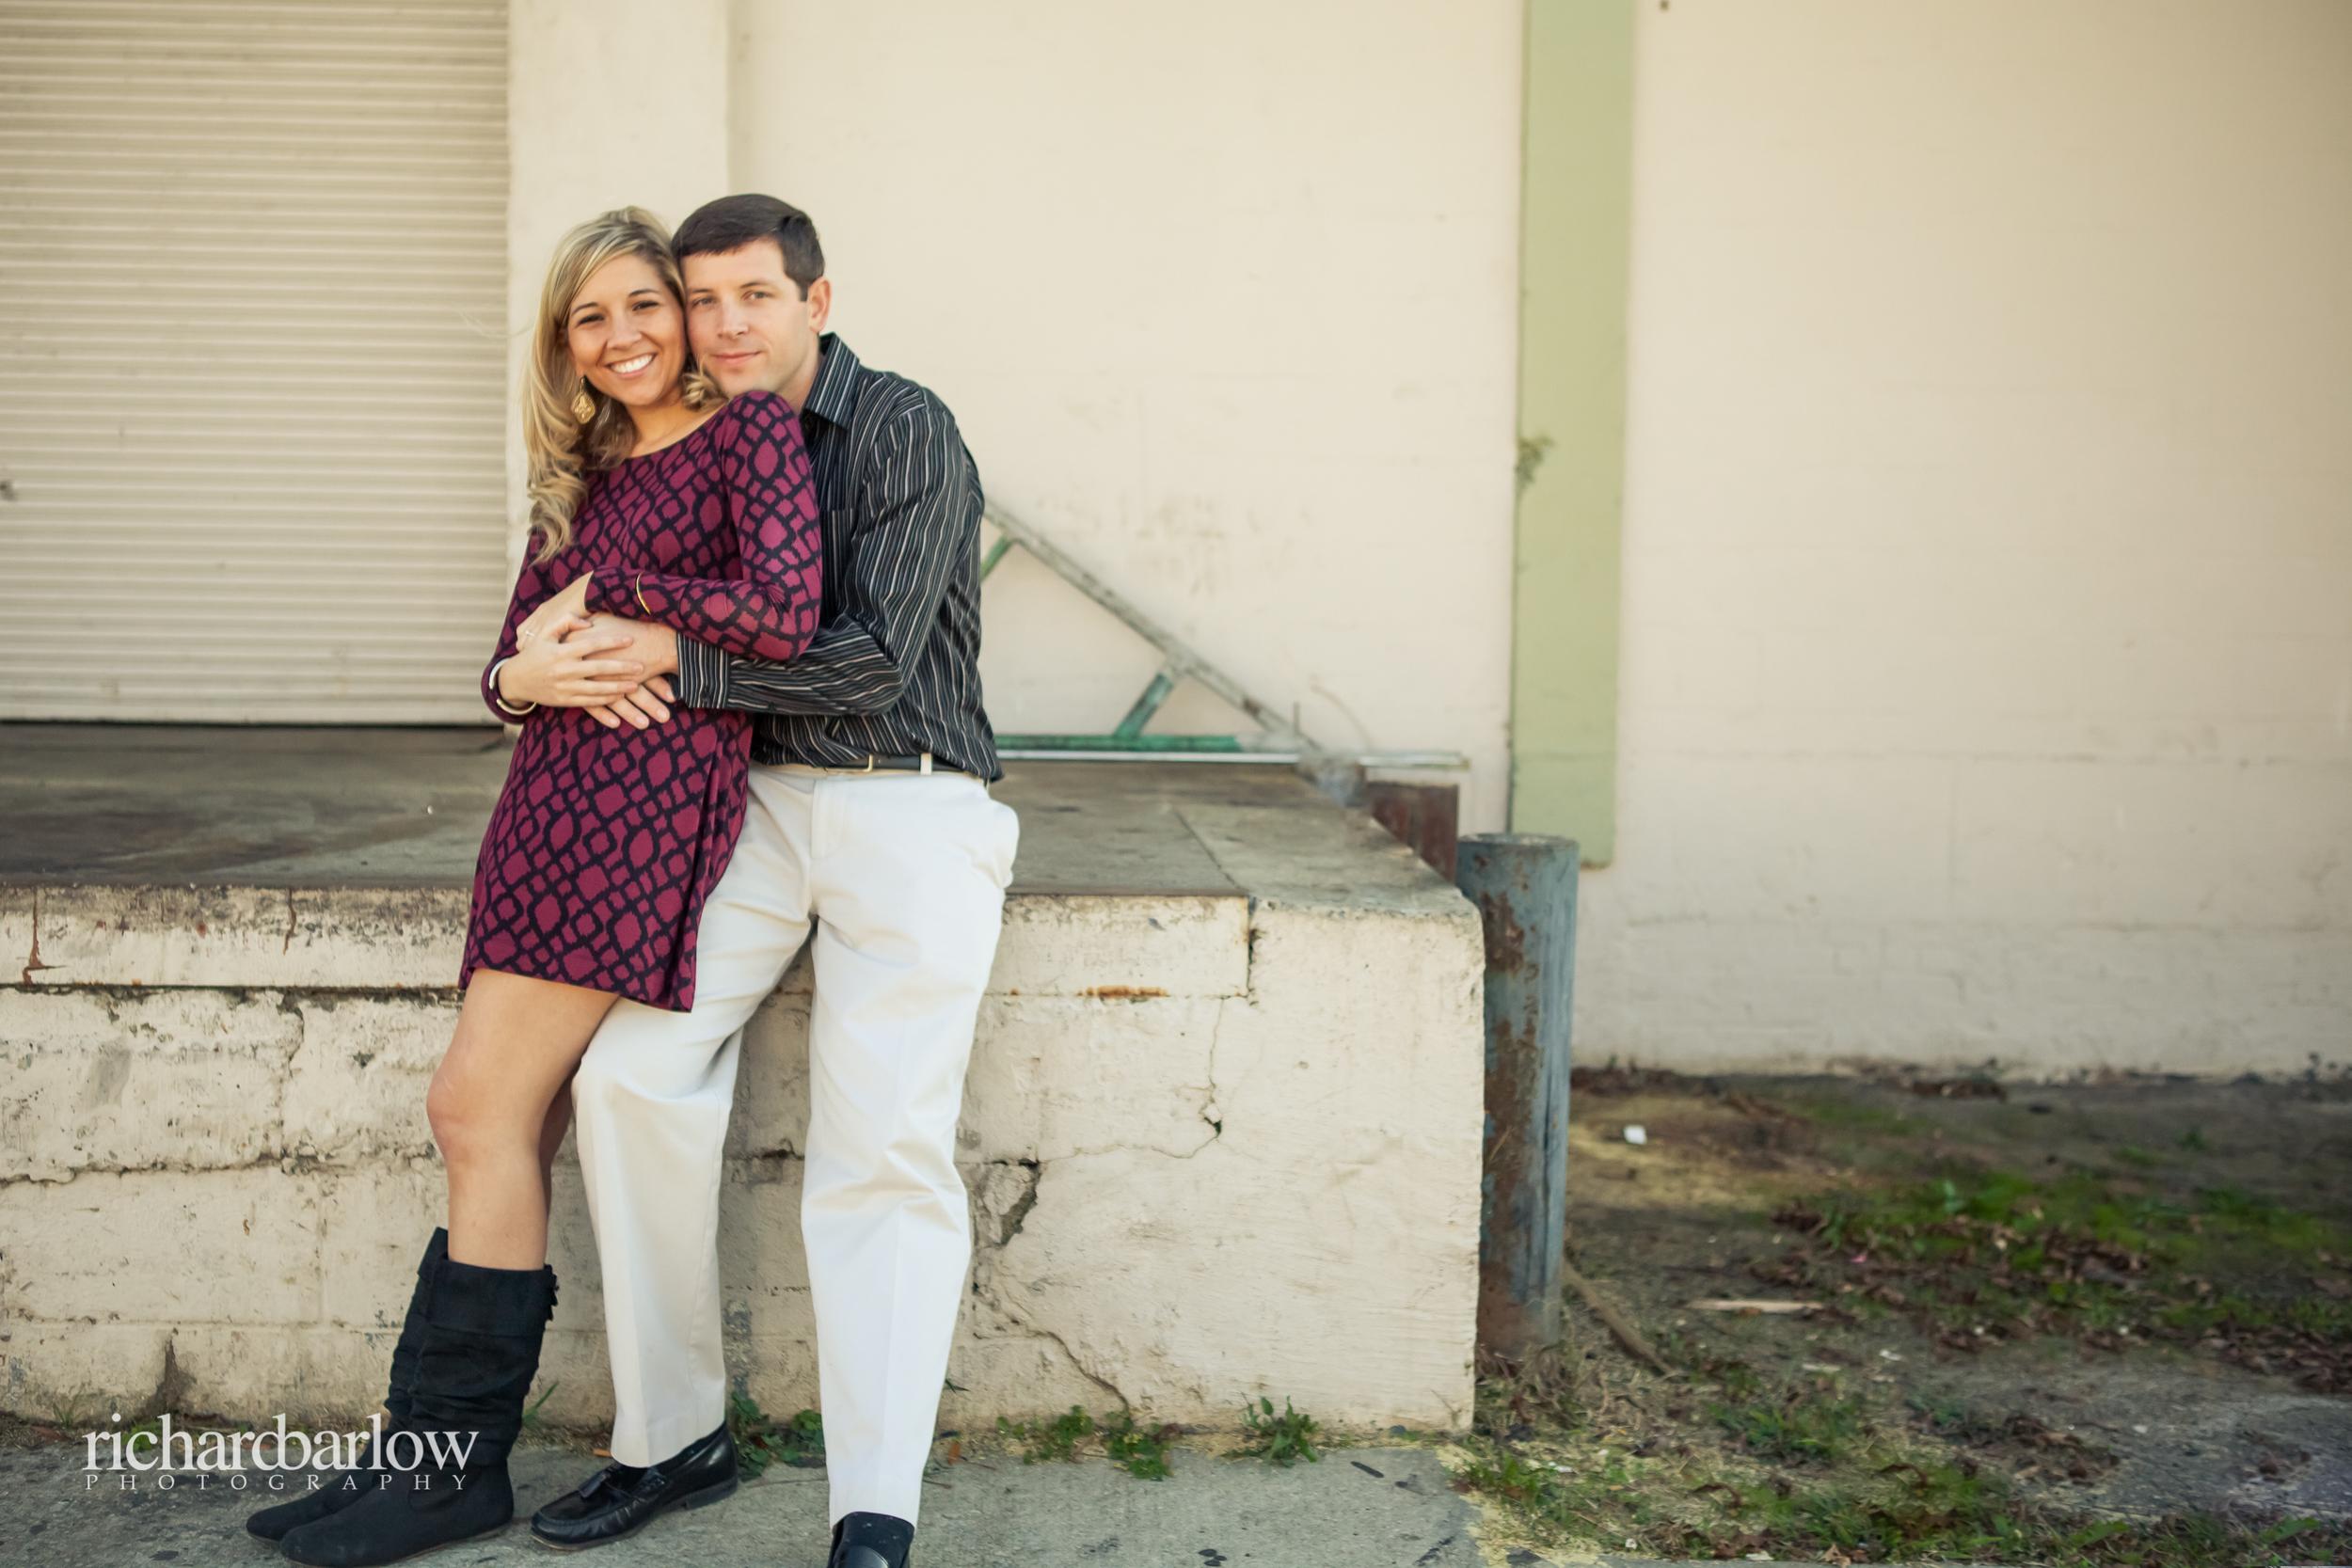 richard barlow photography - Garrett and Heather Engagement Session Raleigh-4.jpg